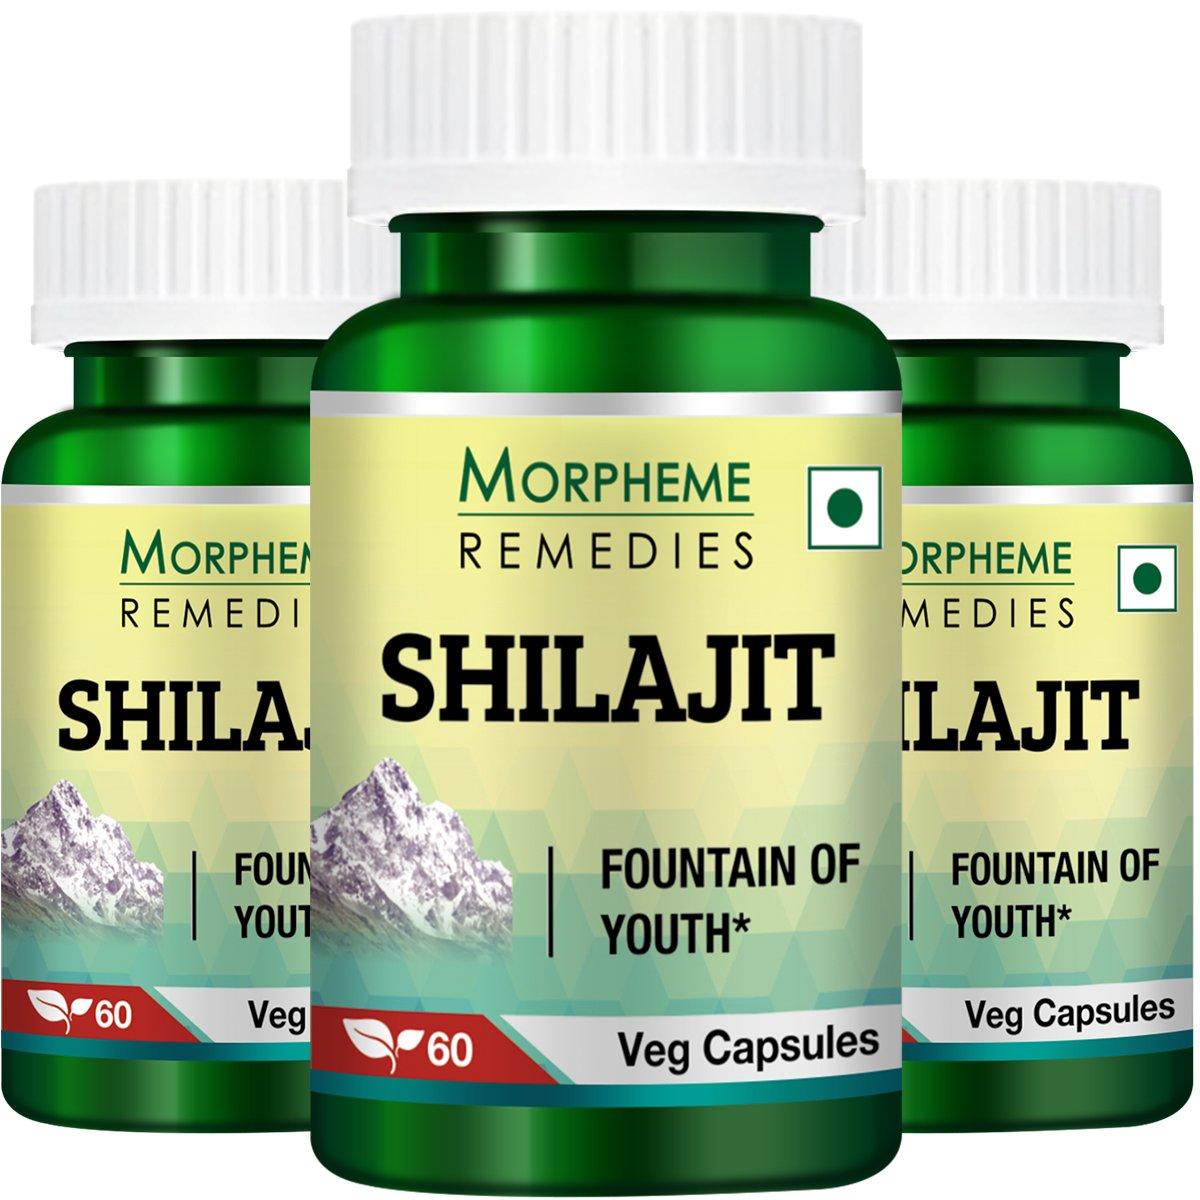 Morpheme Shilajit 500mg Extract 60 Veg Caps - 3 Bottles